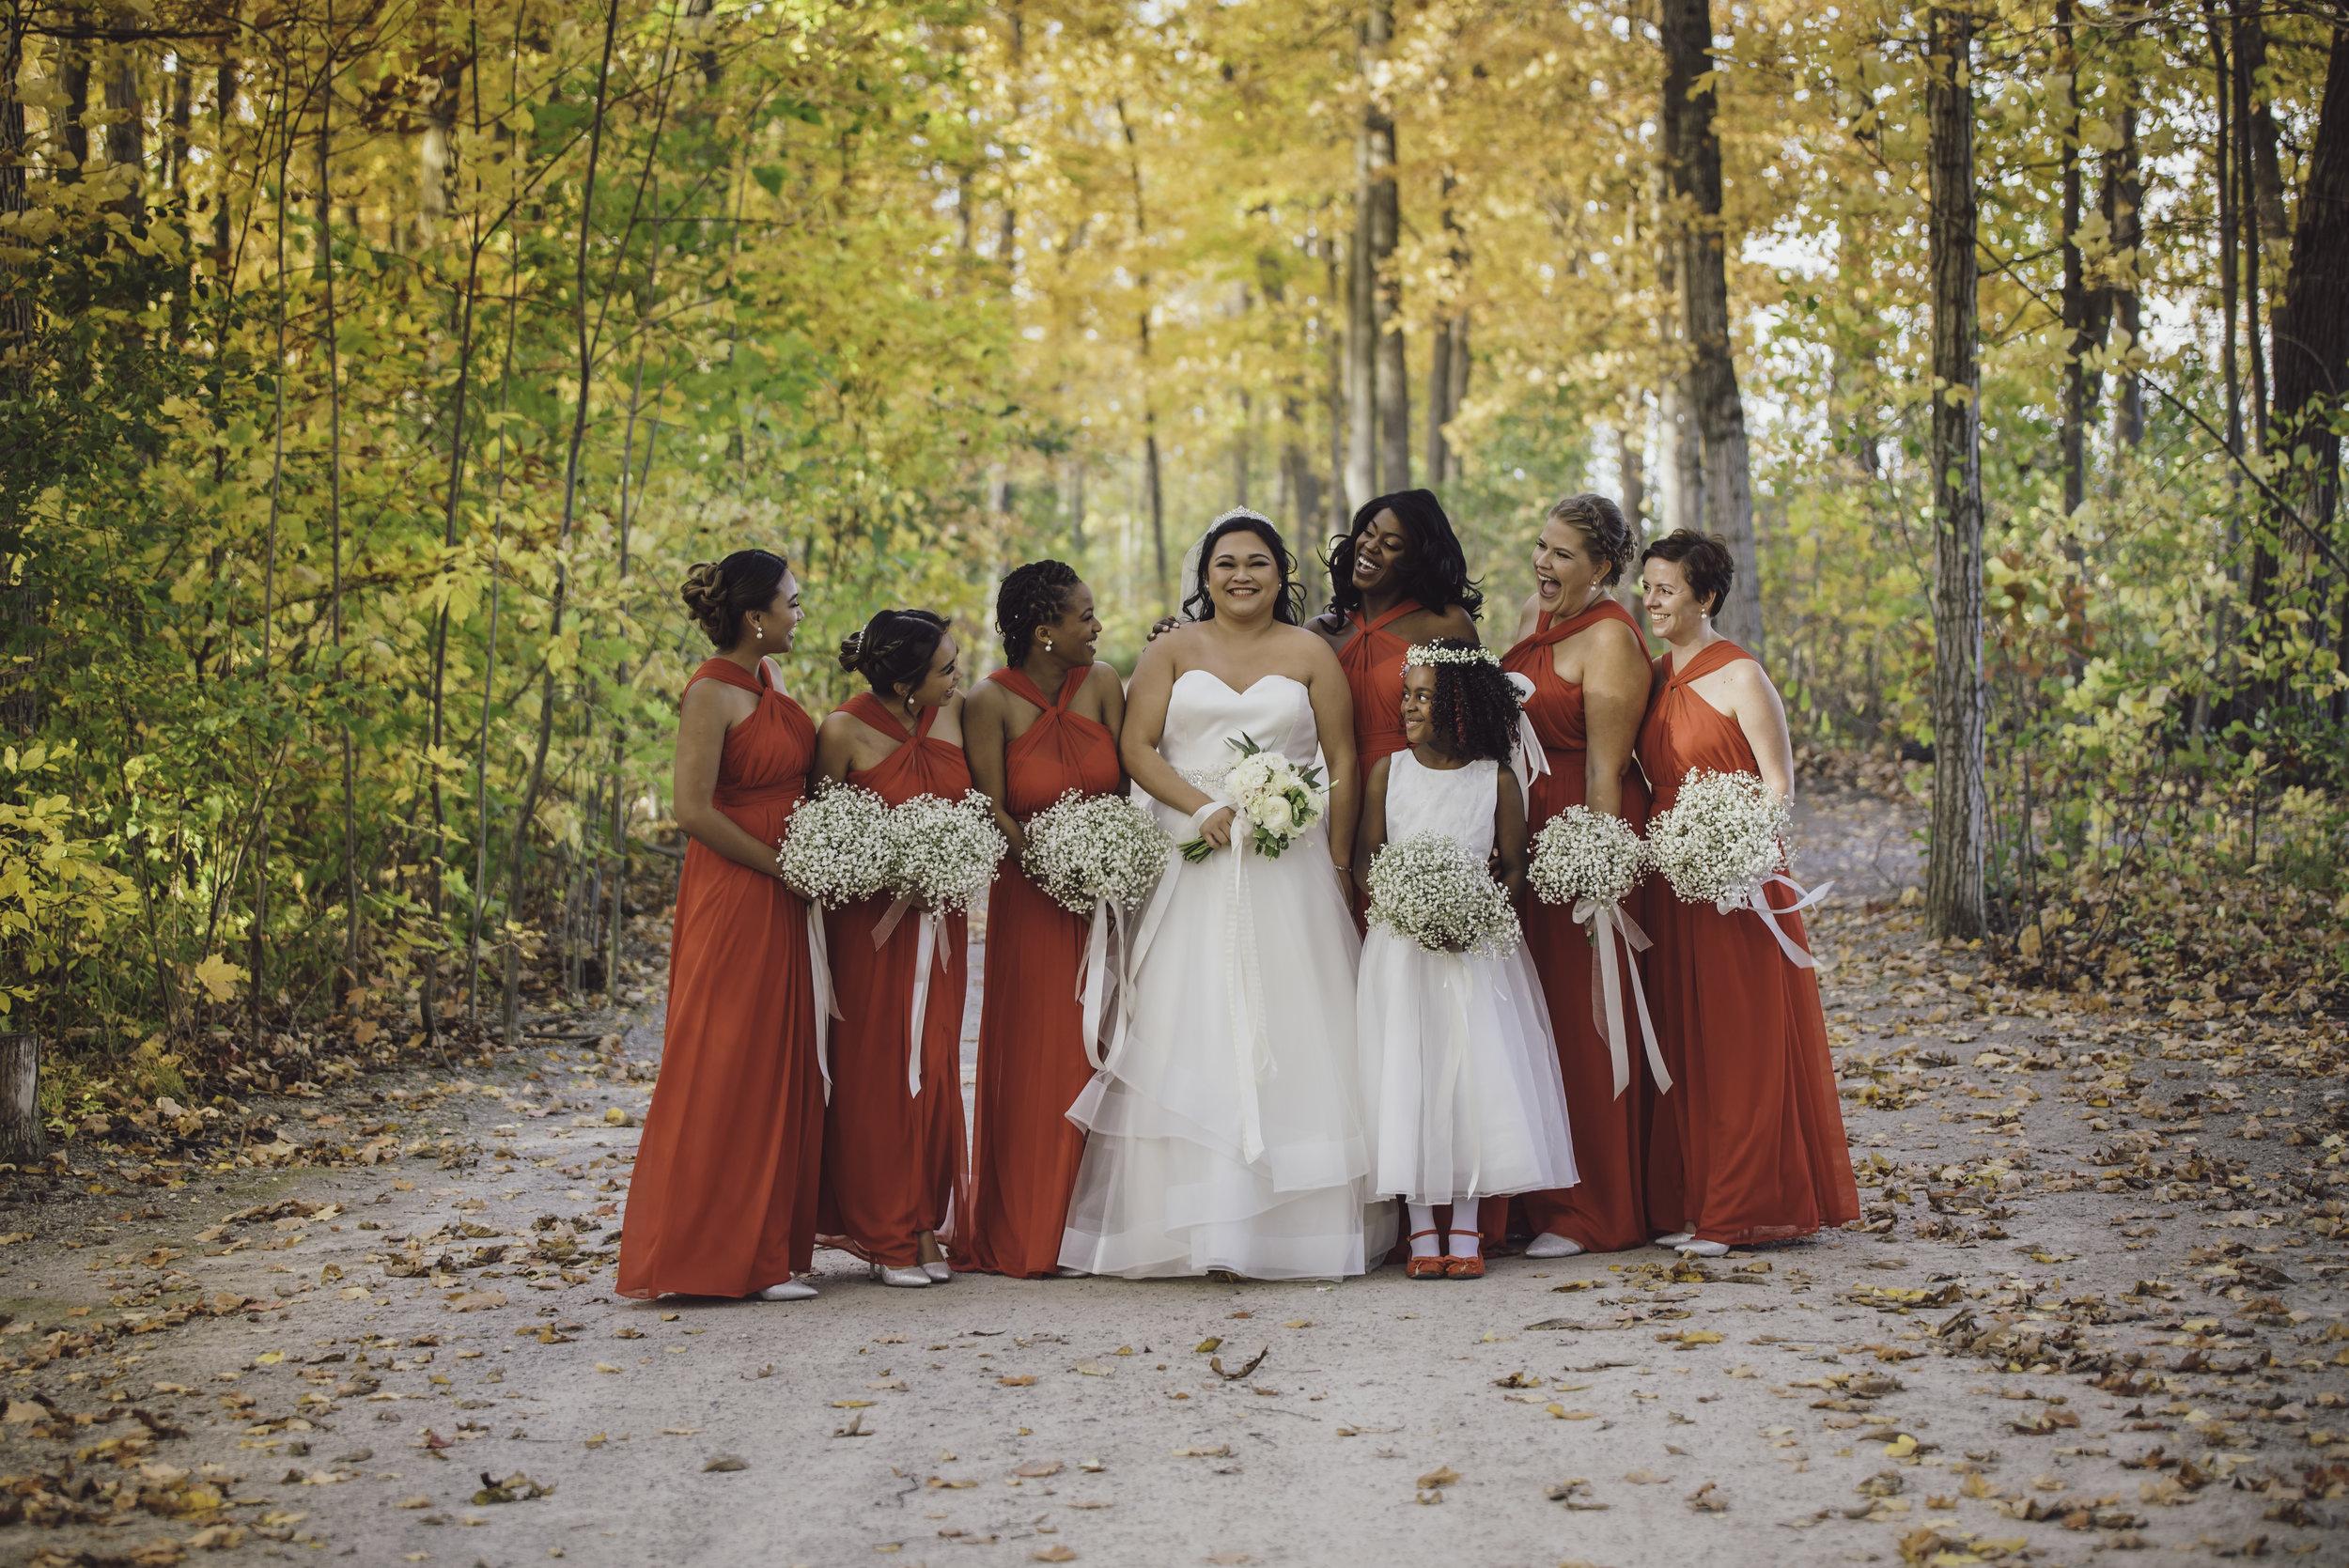 Will&Steph wedding -441.jpg